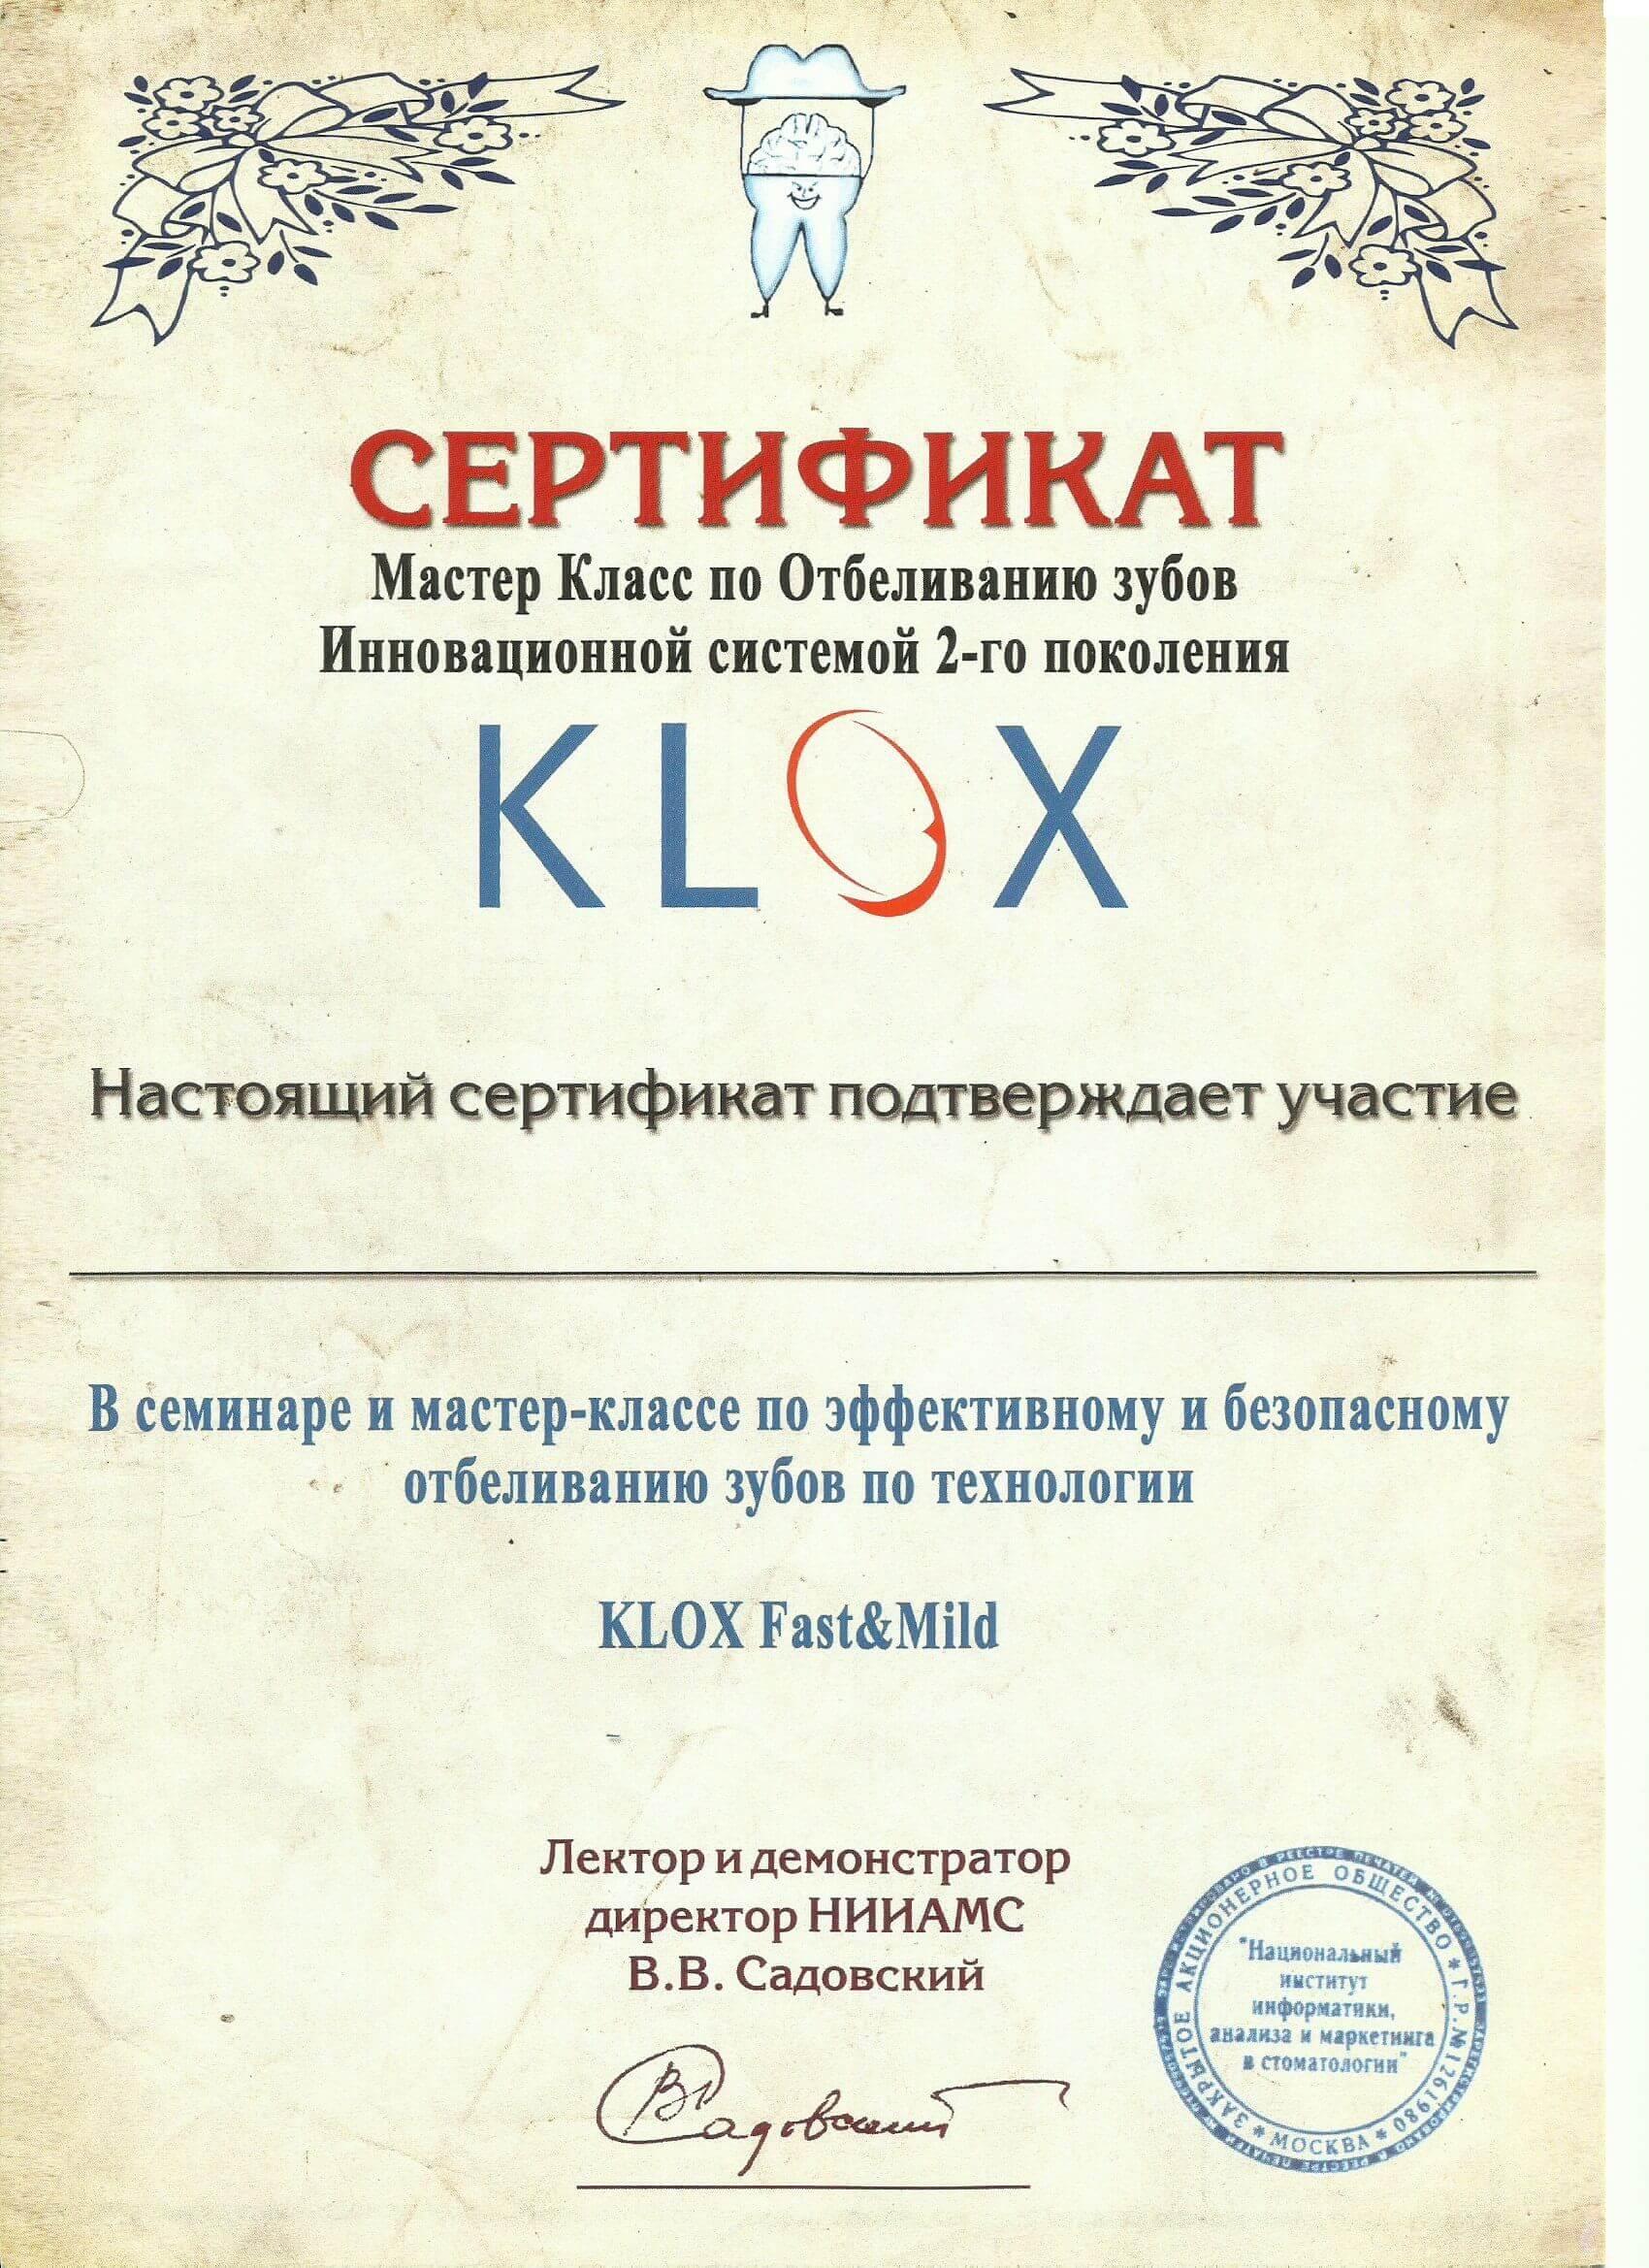 Сертификат KLOX